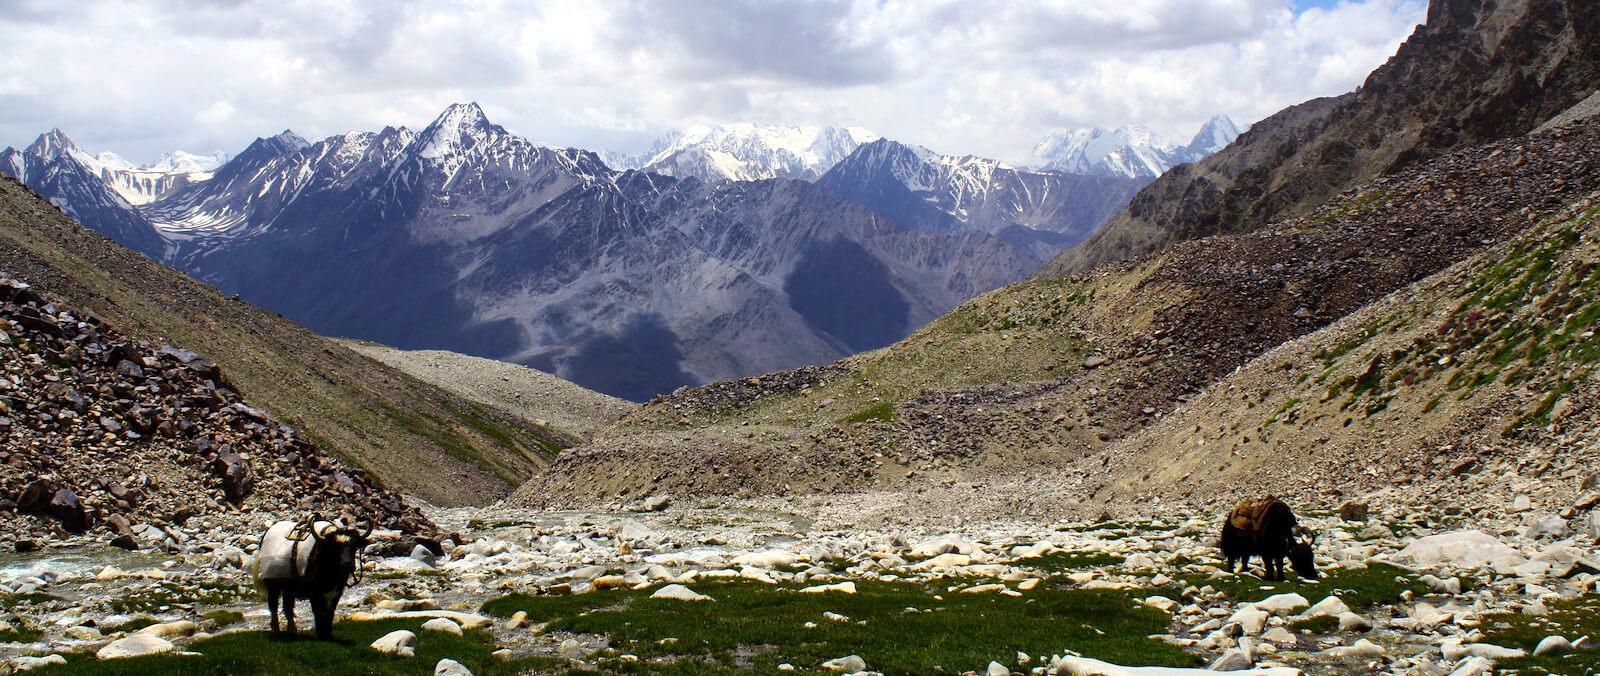 View over the Hindu Kush, Afghan Wakhan Corridor (Photo: mstravels/Flickr)